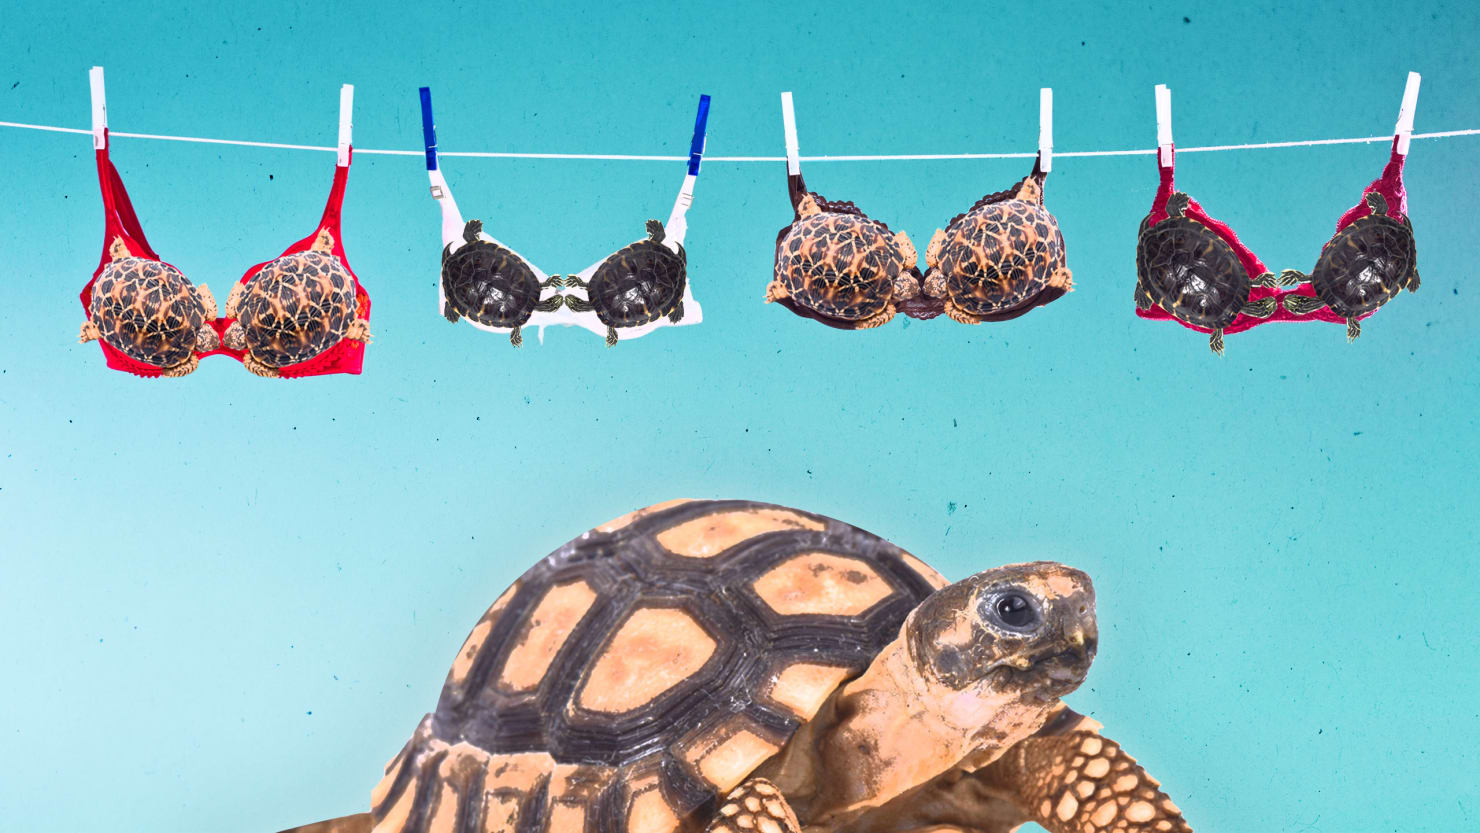 turtle tortoise bikini print richard dick vogt herpetology herpetologist jimh18 david sever willem roosenberg lori neumann lee priya nanjappa